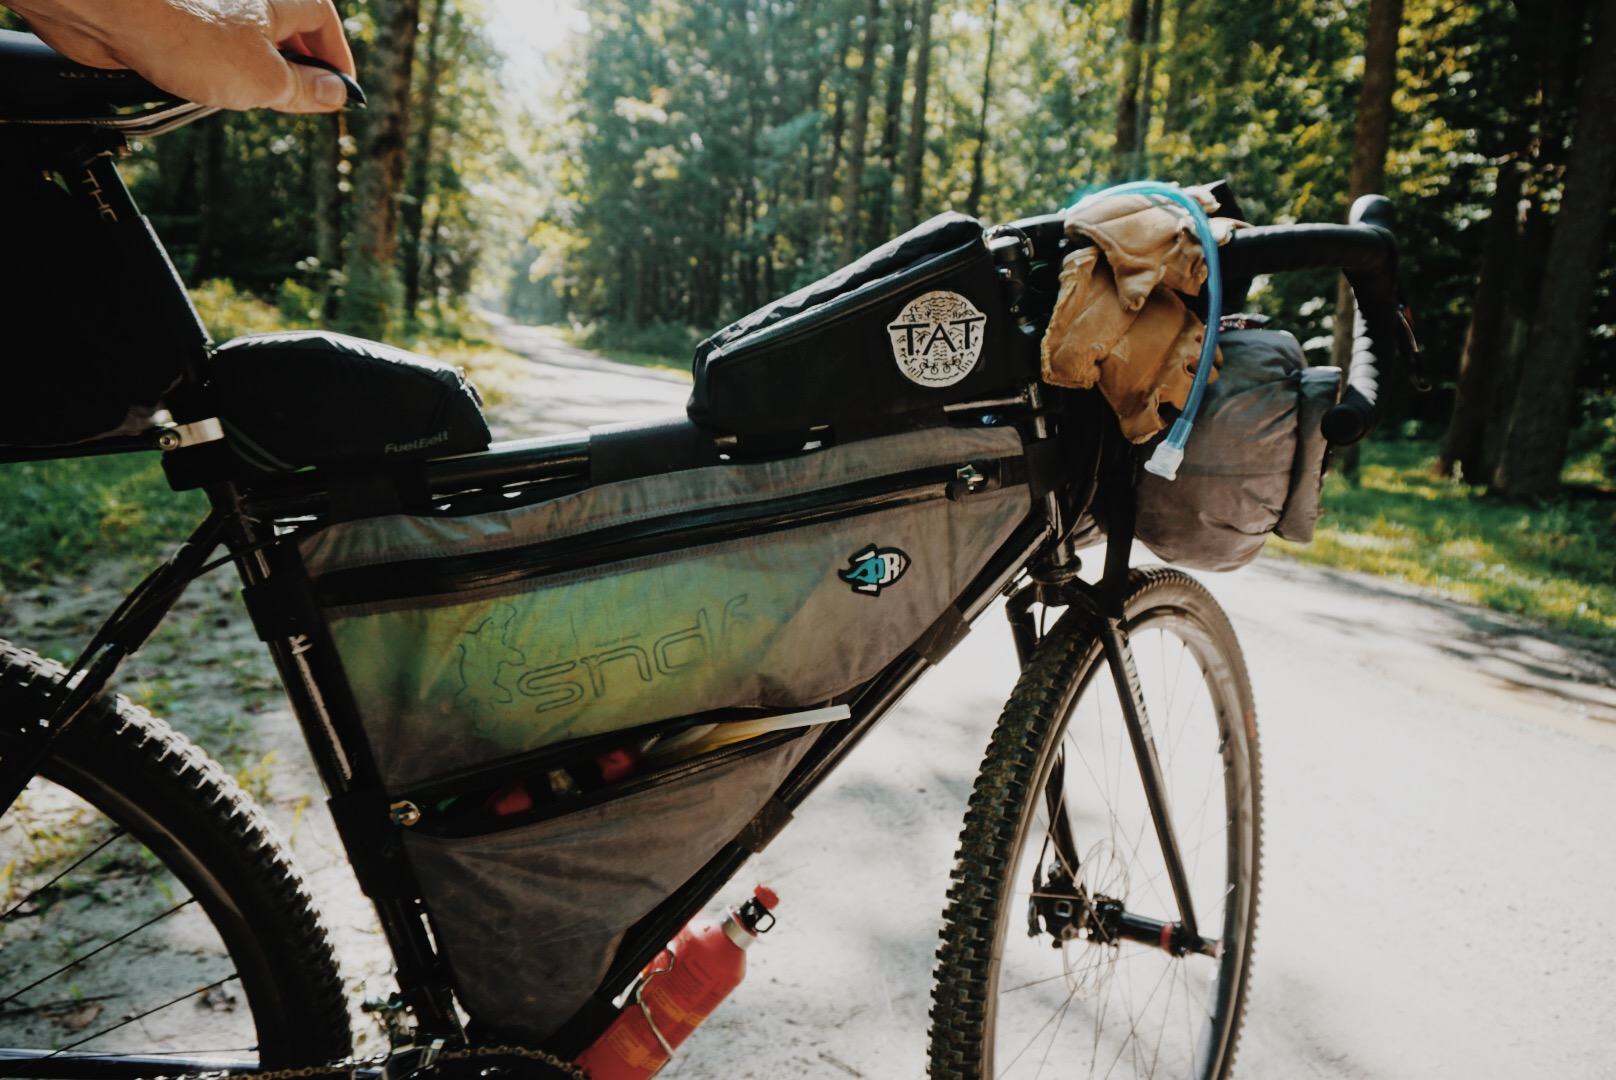 northcarolinatombike.jpg